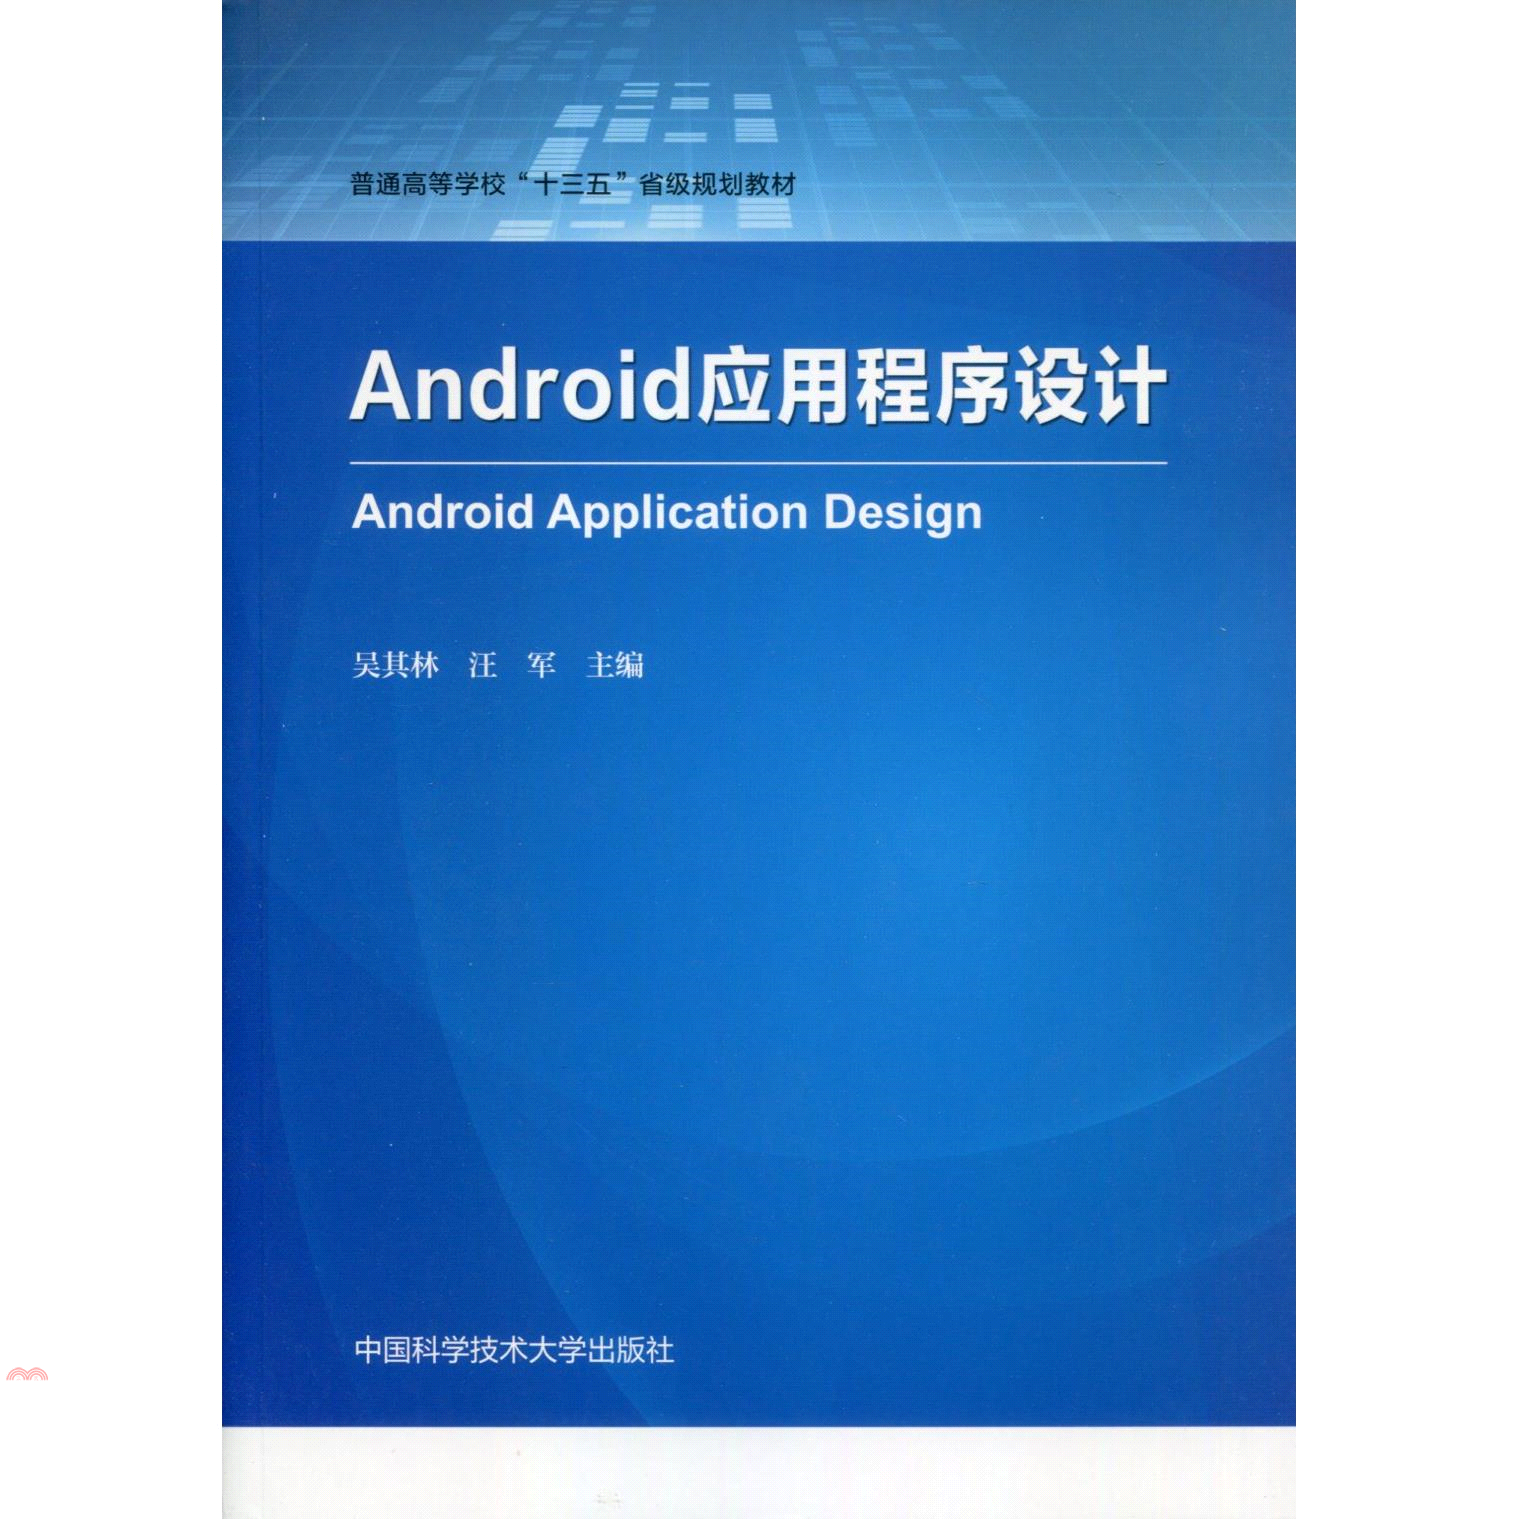 Android應用程序設計(簡體書)[65折]